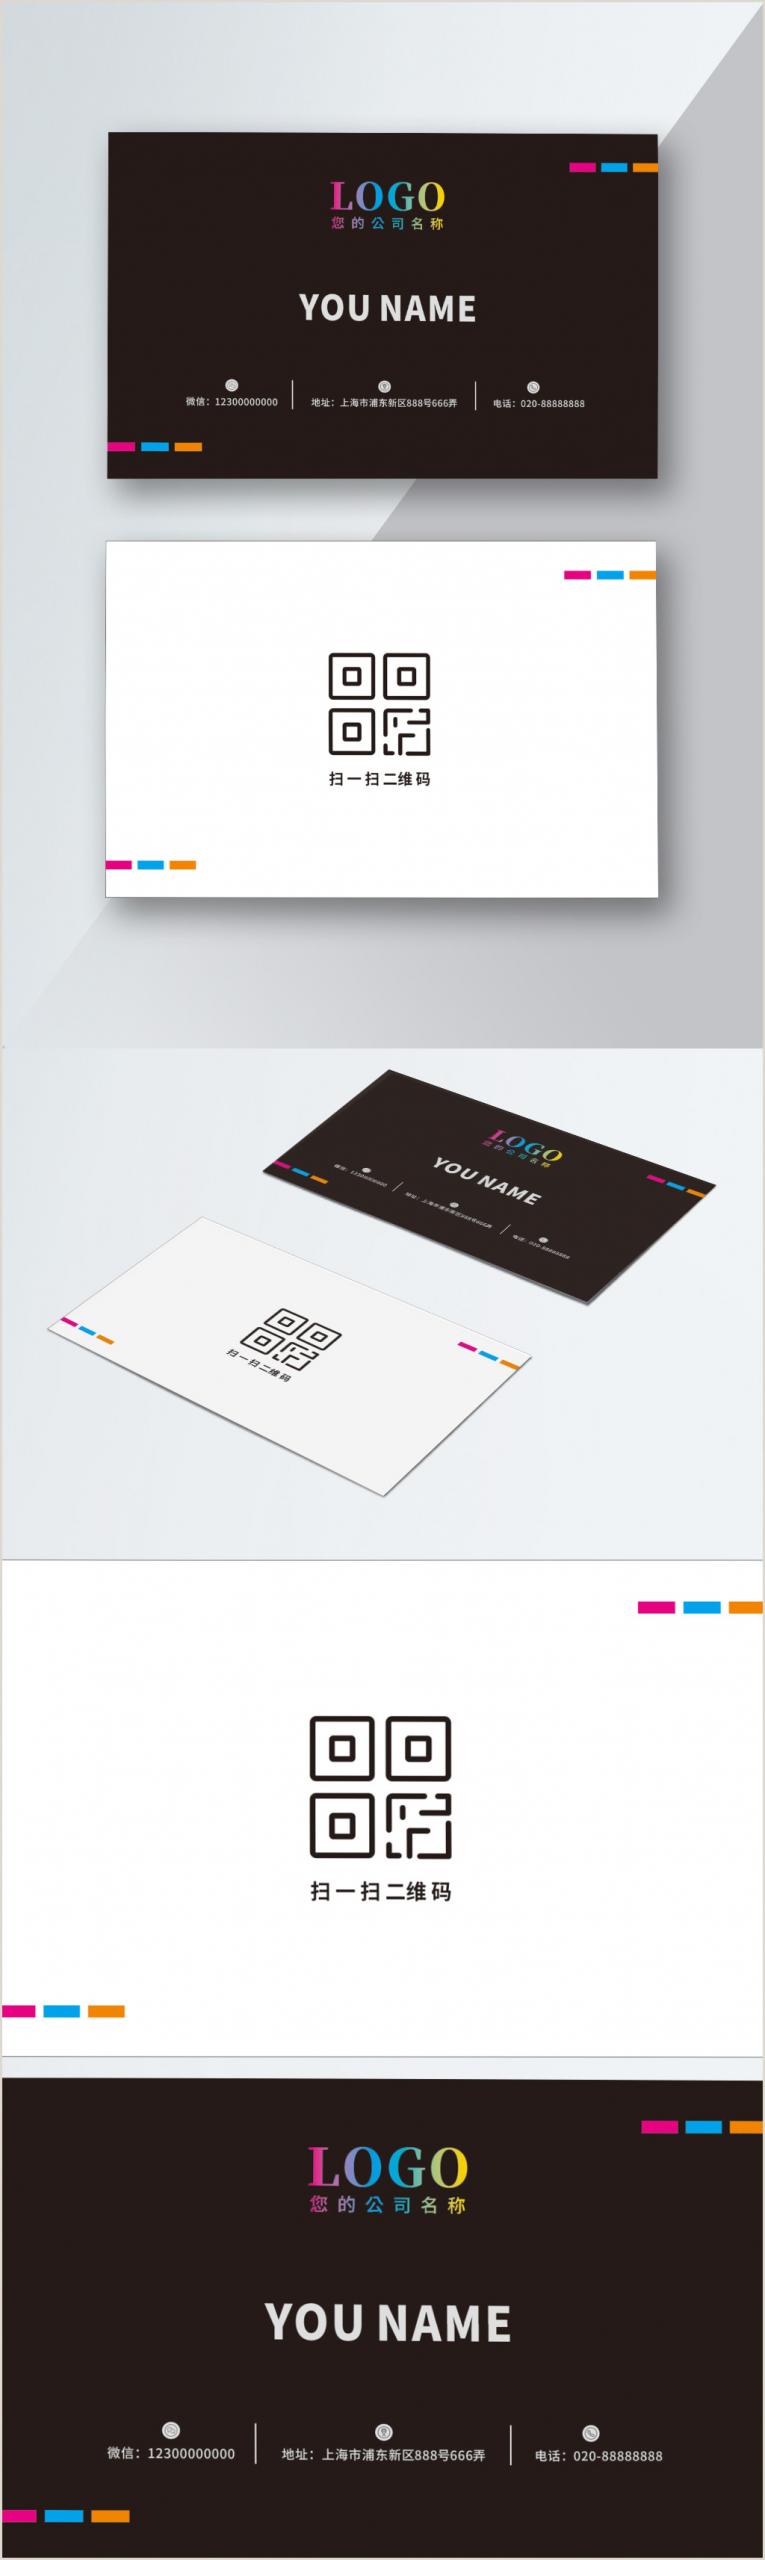 Unique Business Card Template Unique Business Card Template Image Picture Free